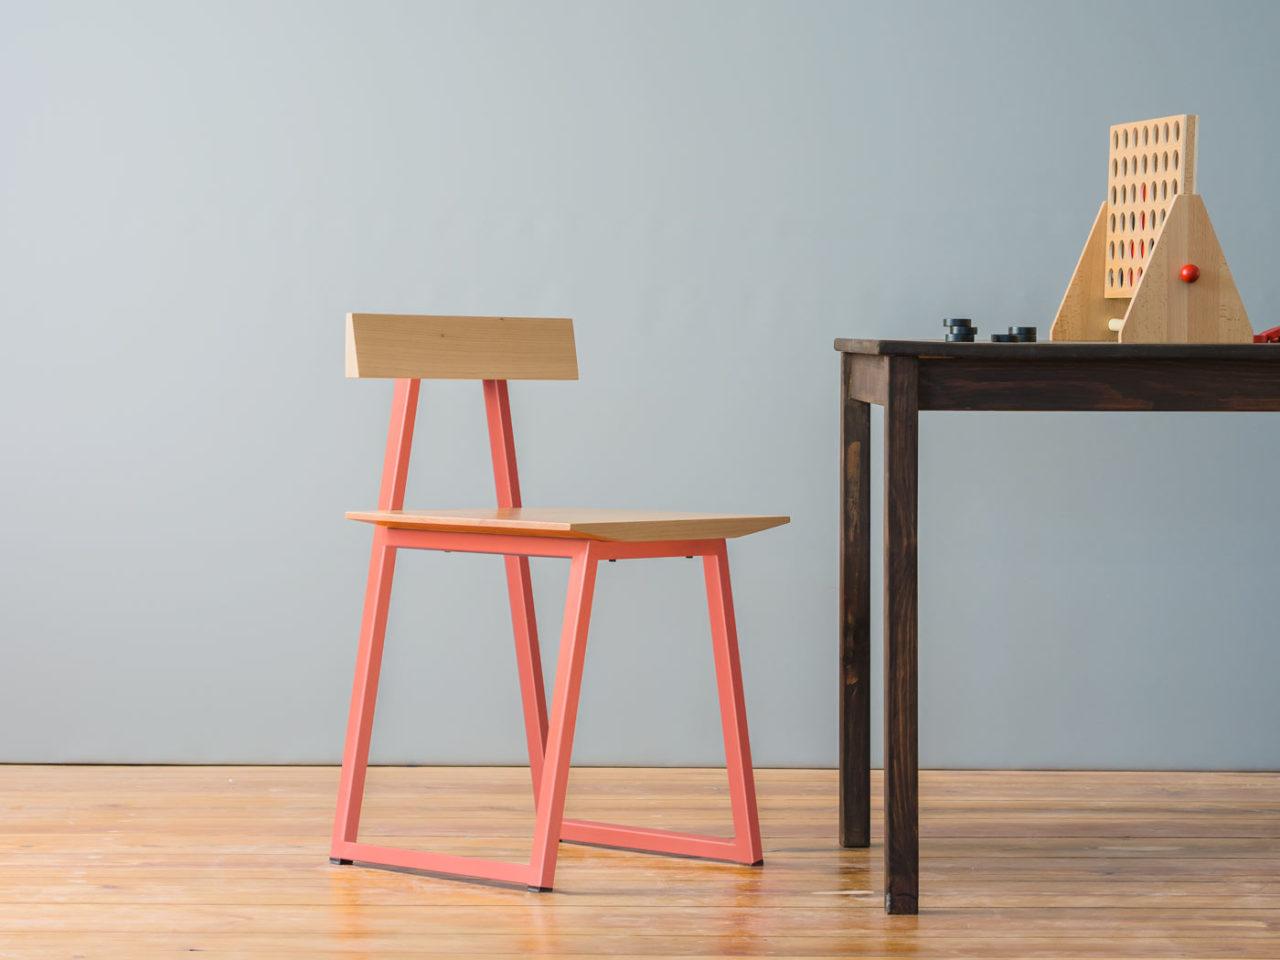 sweet samurai faire m bel f rs leben fromme blum. Black Bedroom Furniture Sets. Home Design Ideas